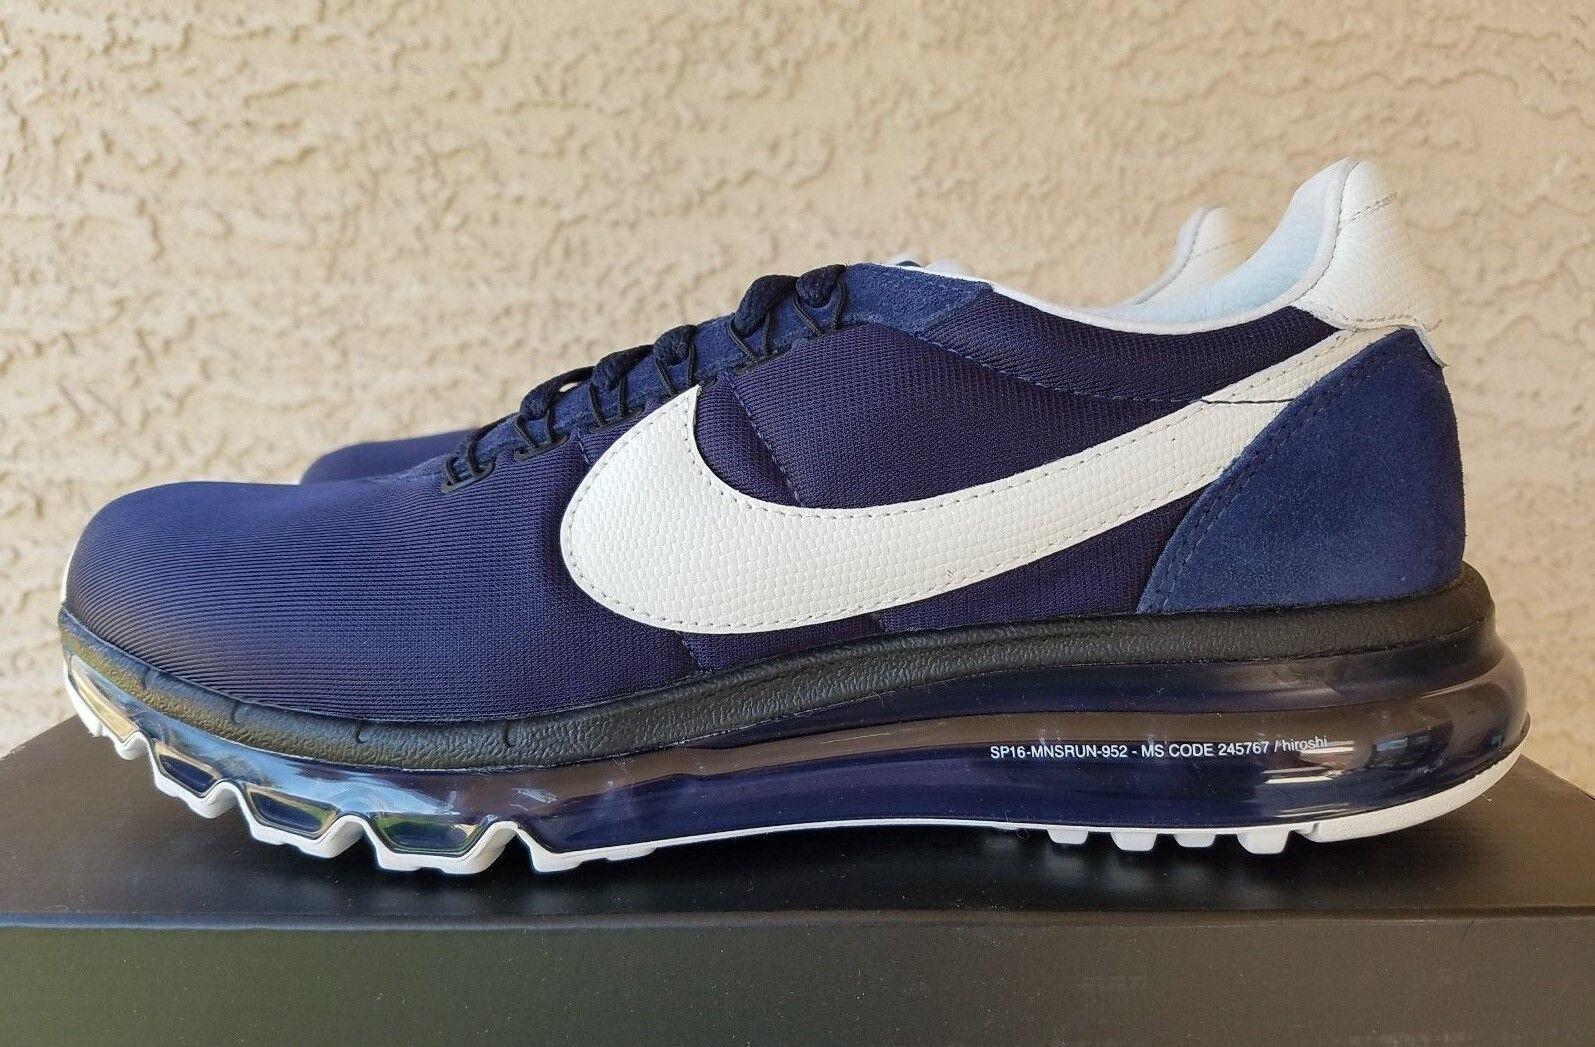 Nike Air Max LD Zero Obsidian White 848624-410 Hiroshi Fujiwara Size 5.5